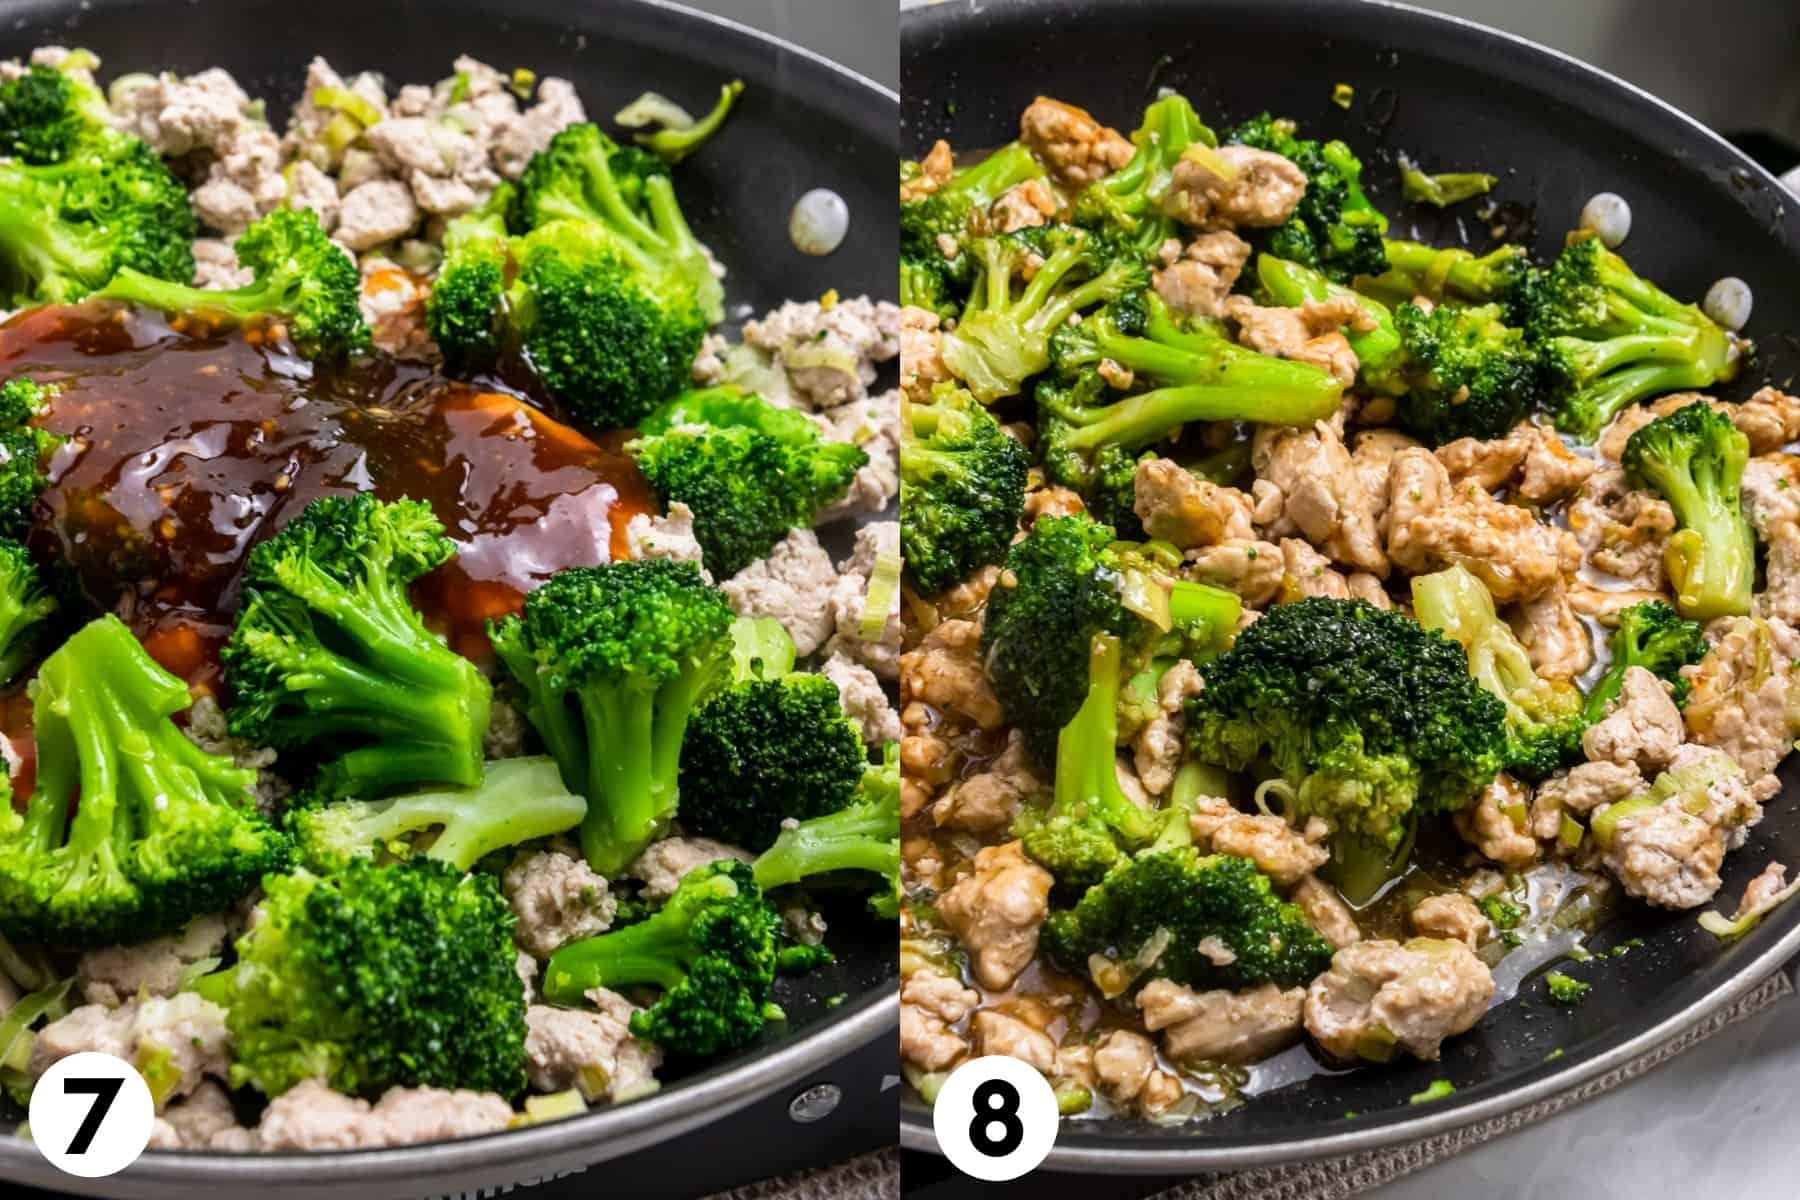 Broccoli and teriyaki sauce in pan.